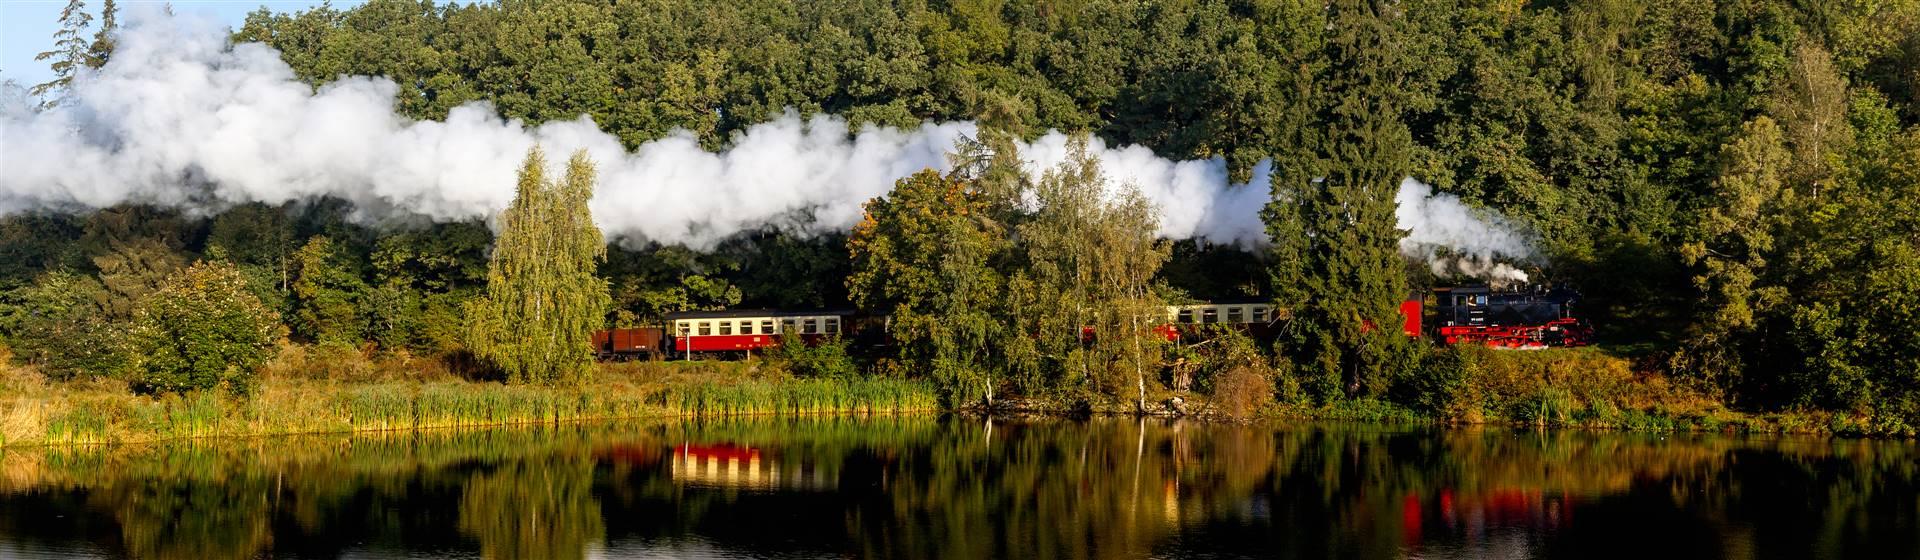 "<img src=""hsbtrain-shutterstock_343712621(2).jpeg"" alt=""HSB Train""/>"